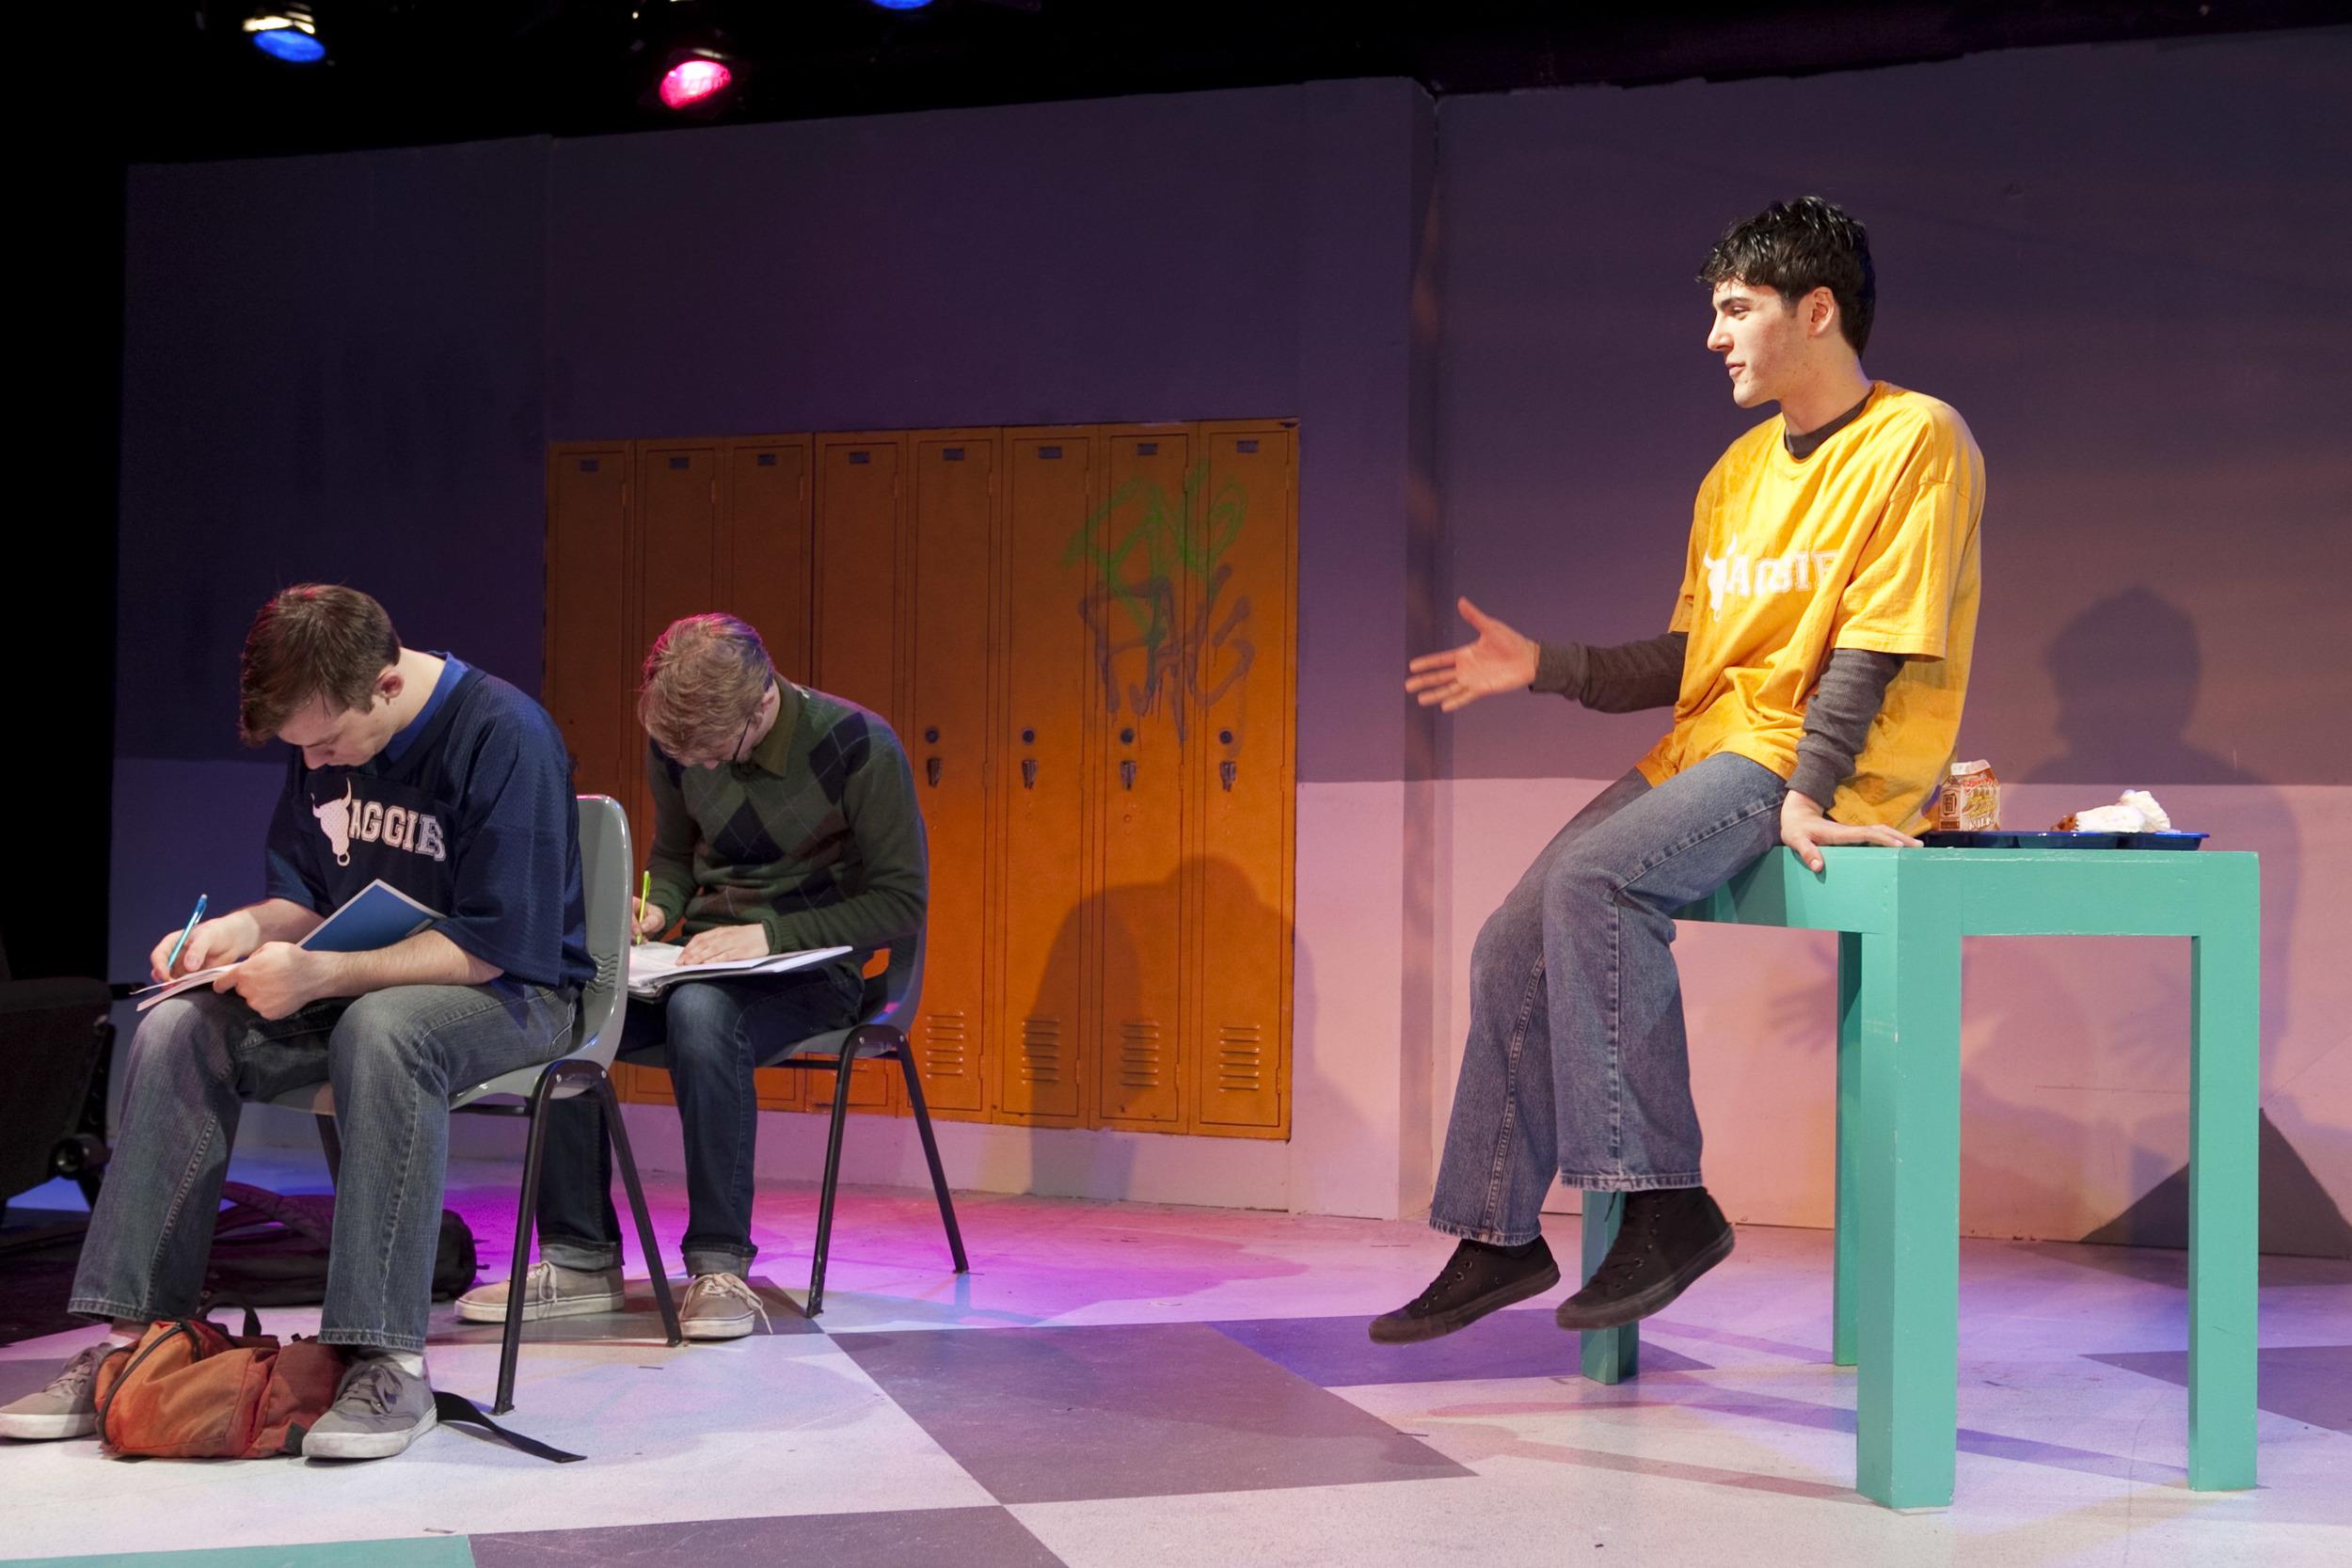 L to R: J. Alexander Coe, Jacob Mondry, David Rosenblatt. (Photo by Chasi Annexy)